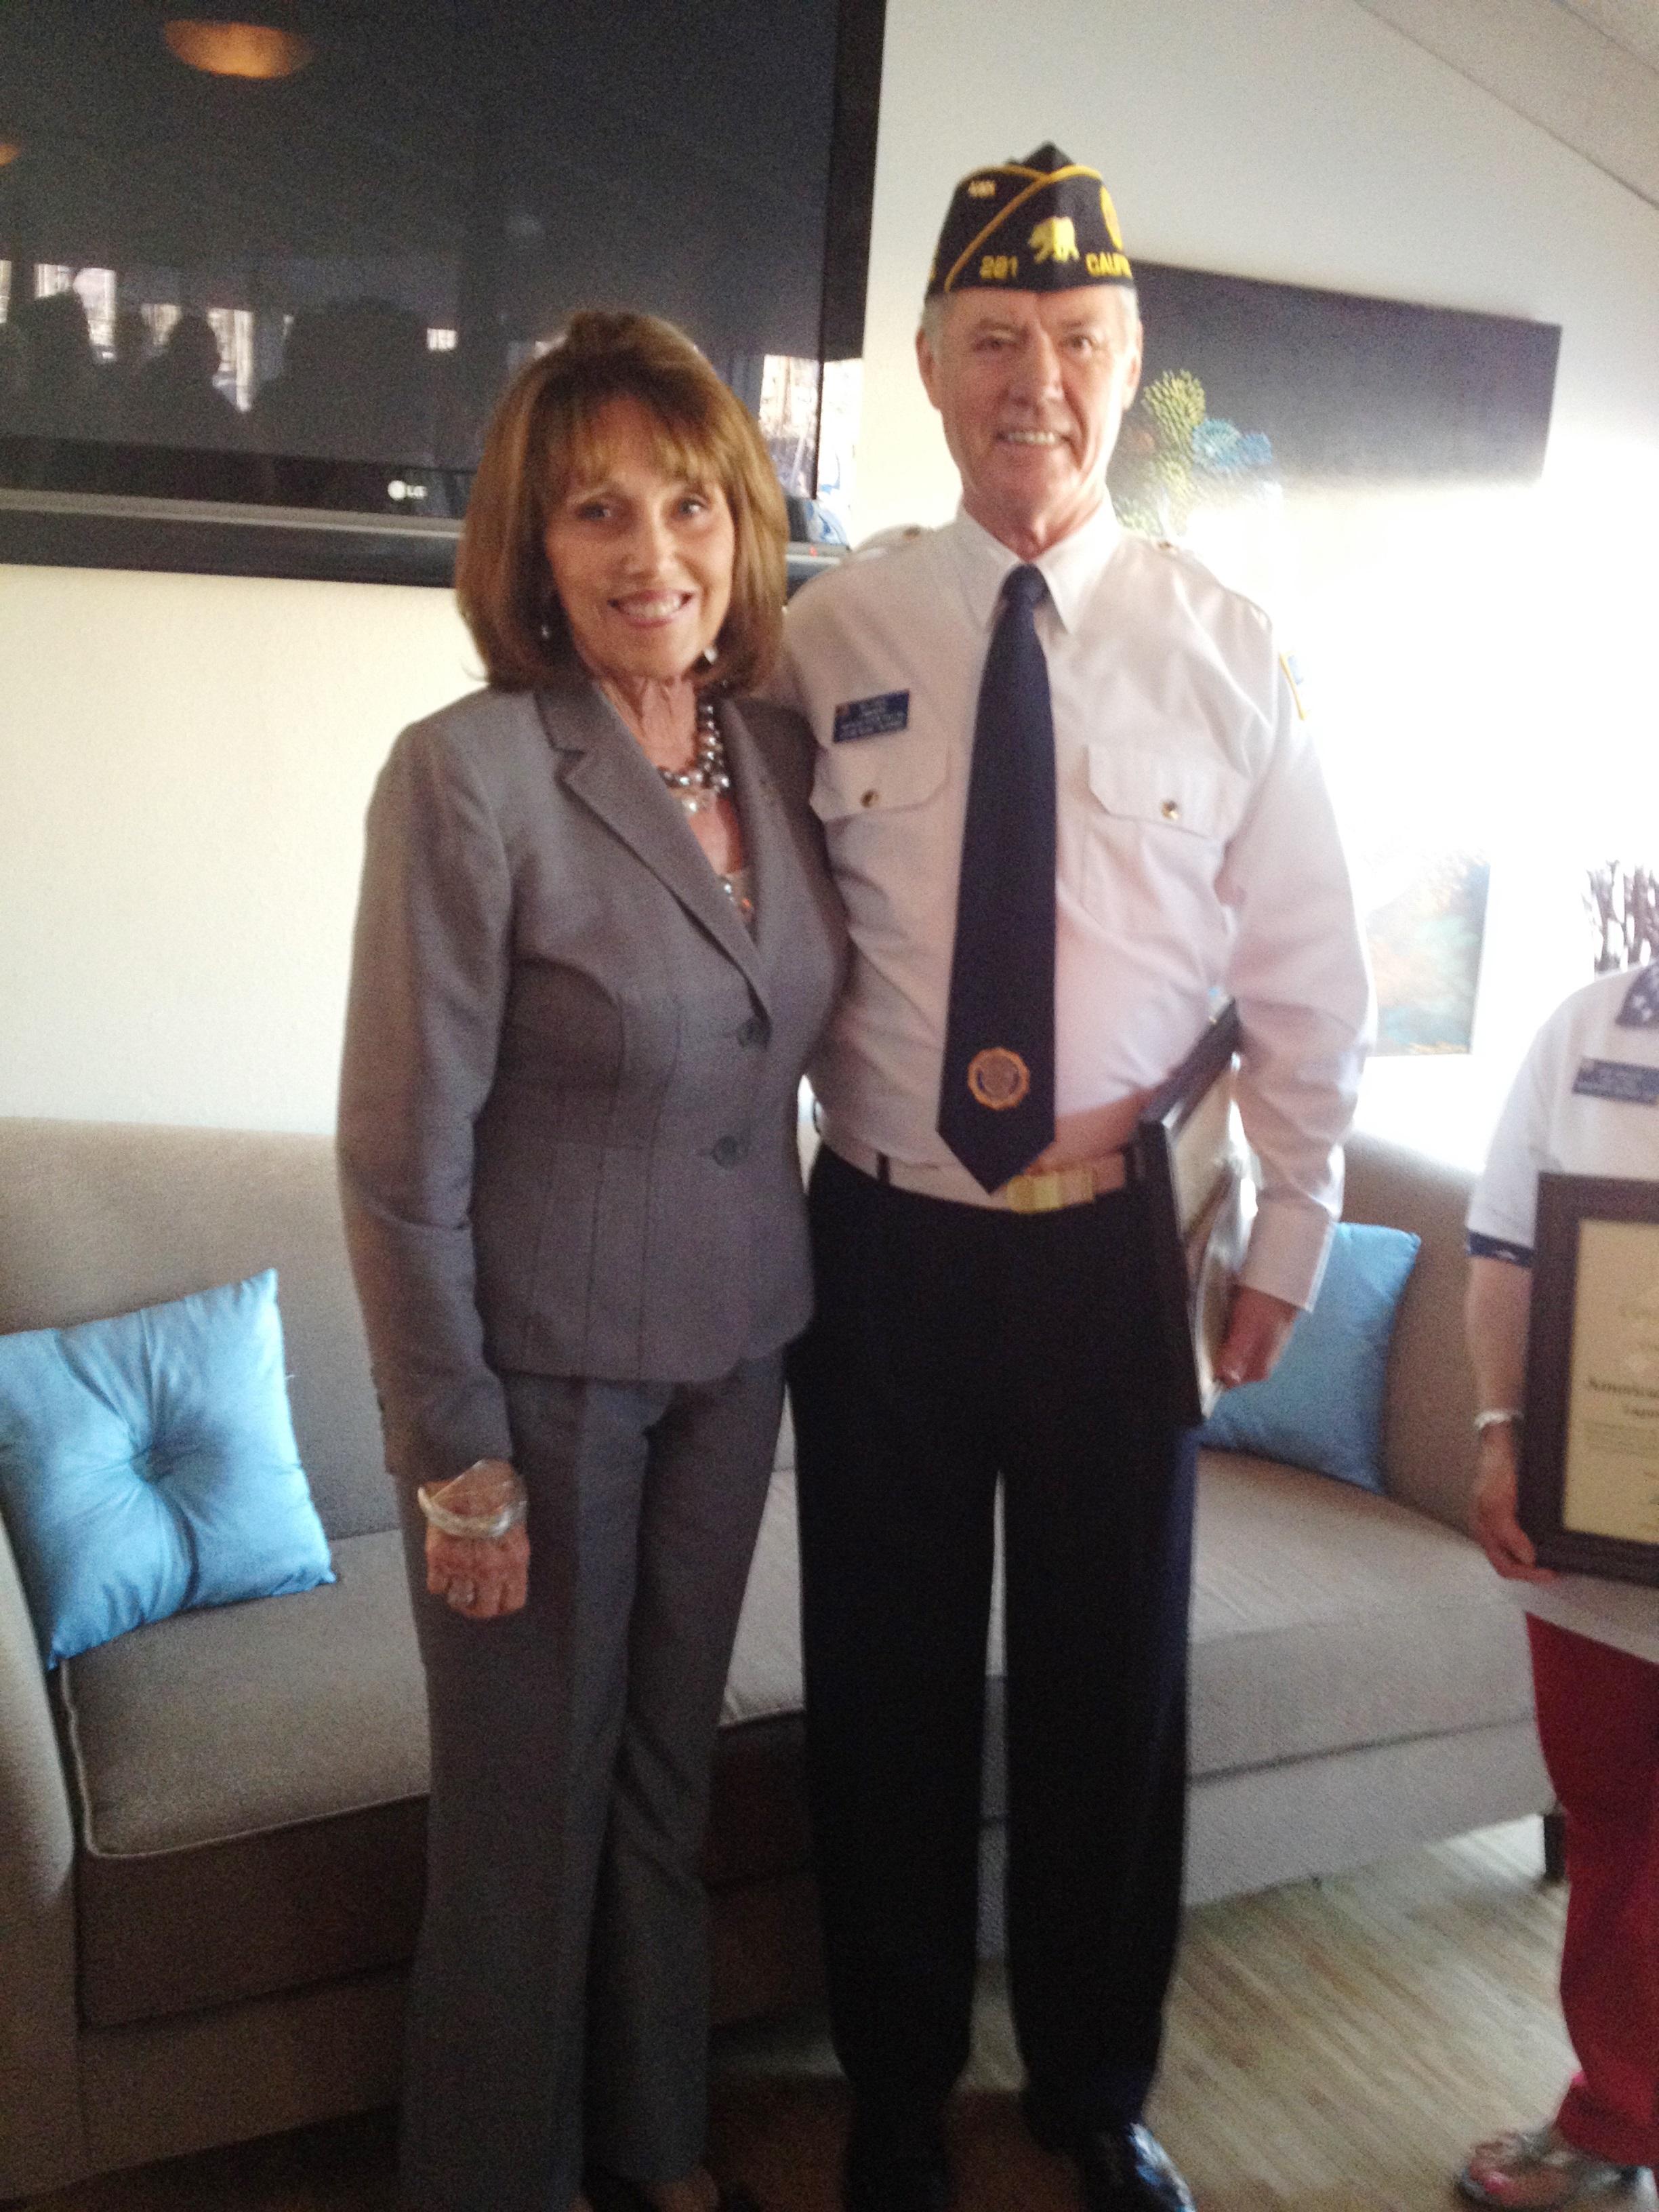 Orange County Supervisor Pat Bates and American Legion Post 281 commander Bill Leber. Photo by Andrea Papagianis